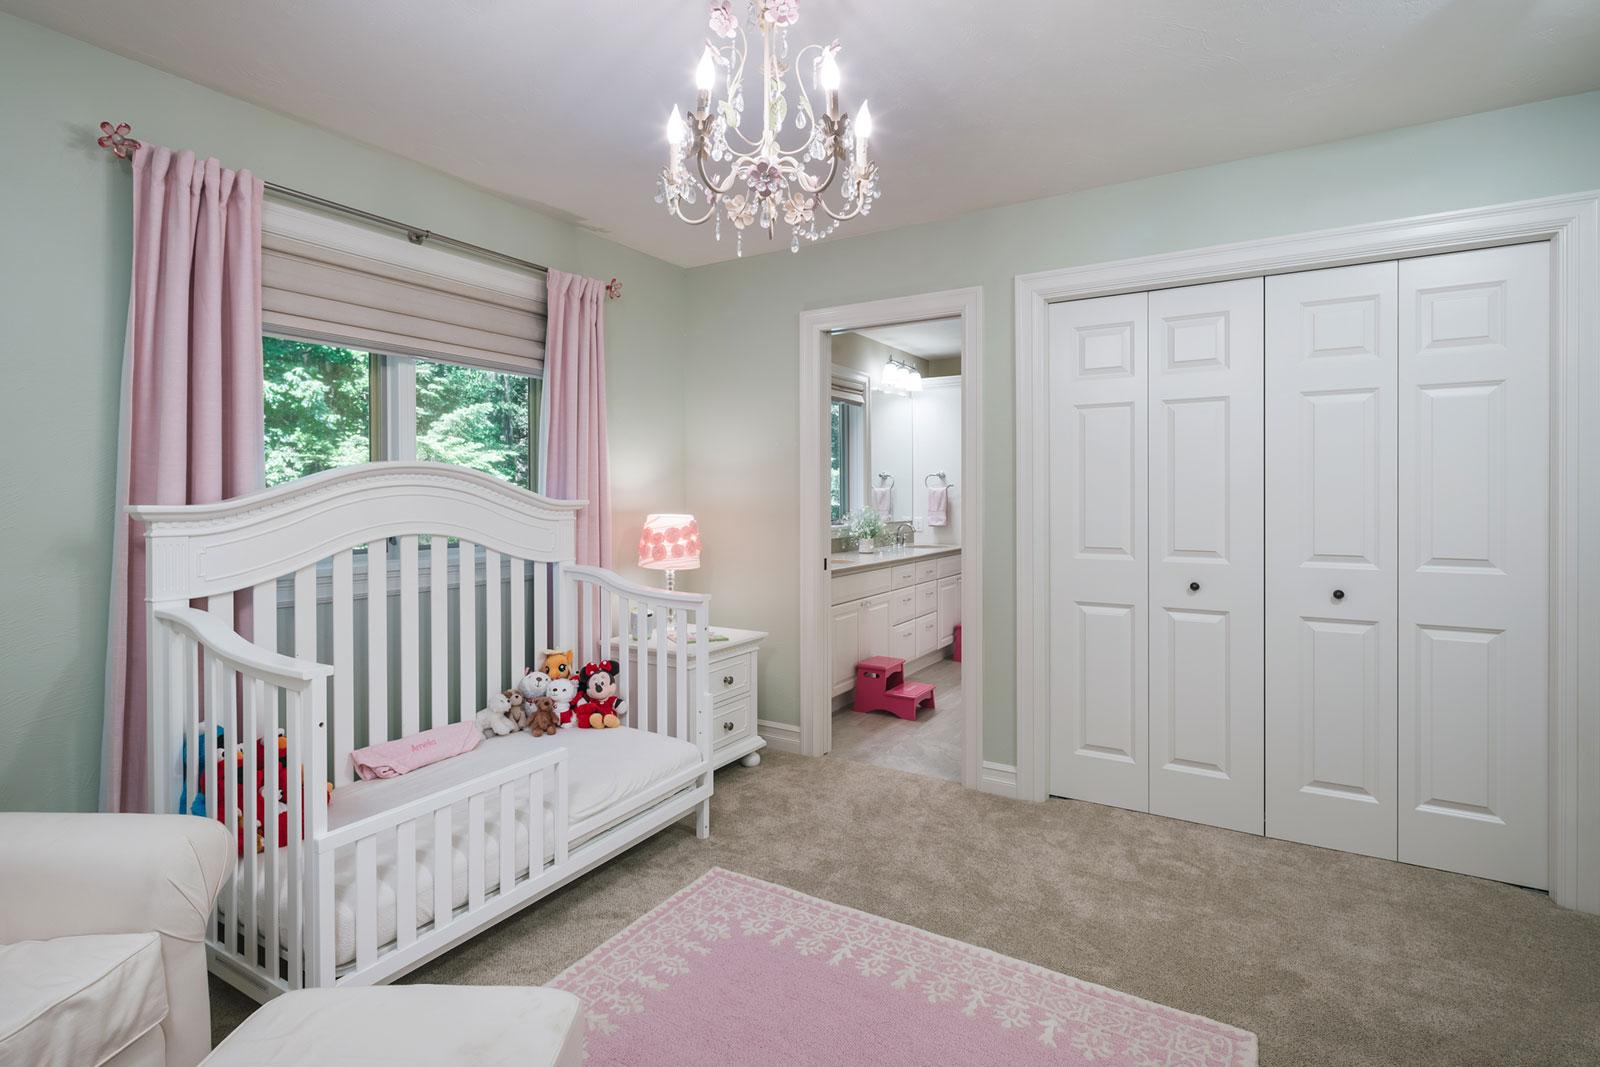 traditional home remodel - Henderer Design + Build, Corvallis OR